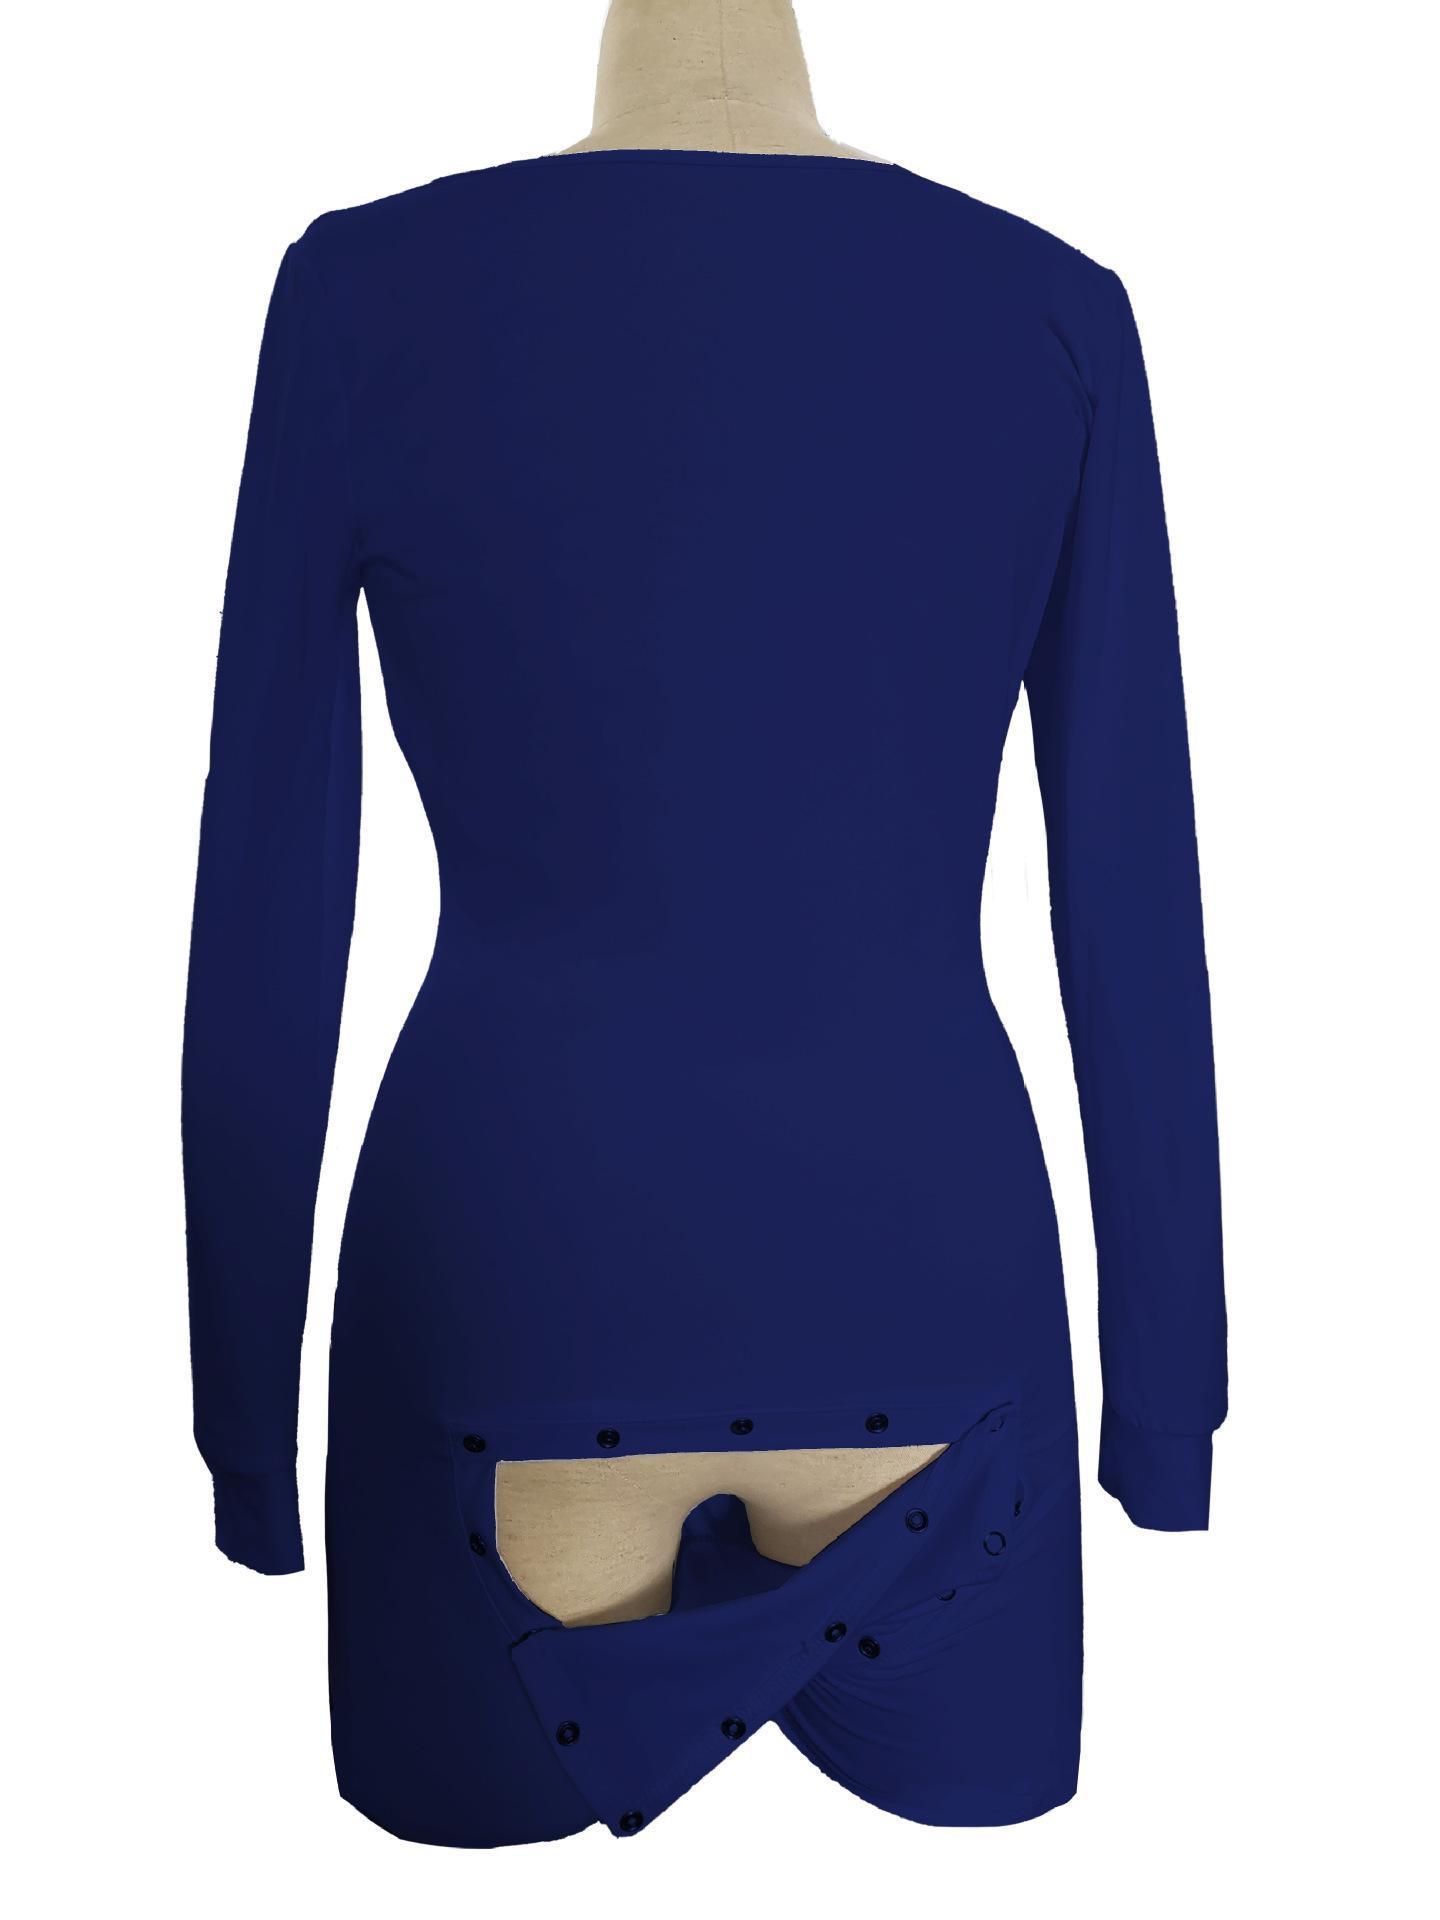 Women Jumpsuits Rompers Designer Pajama Onesies Nightwear Bodysuit Workout Button Skinny Hot Print V-neck Short Onesies DHL